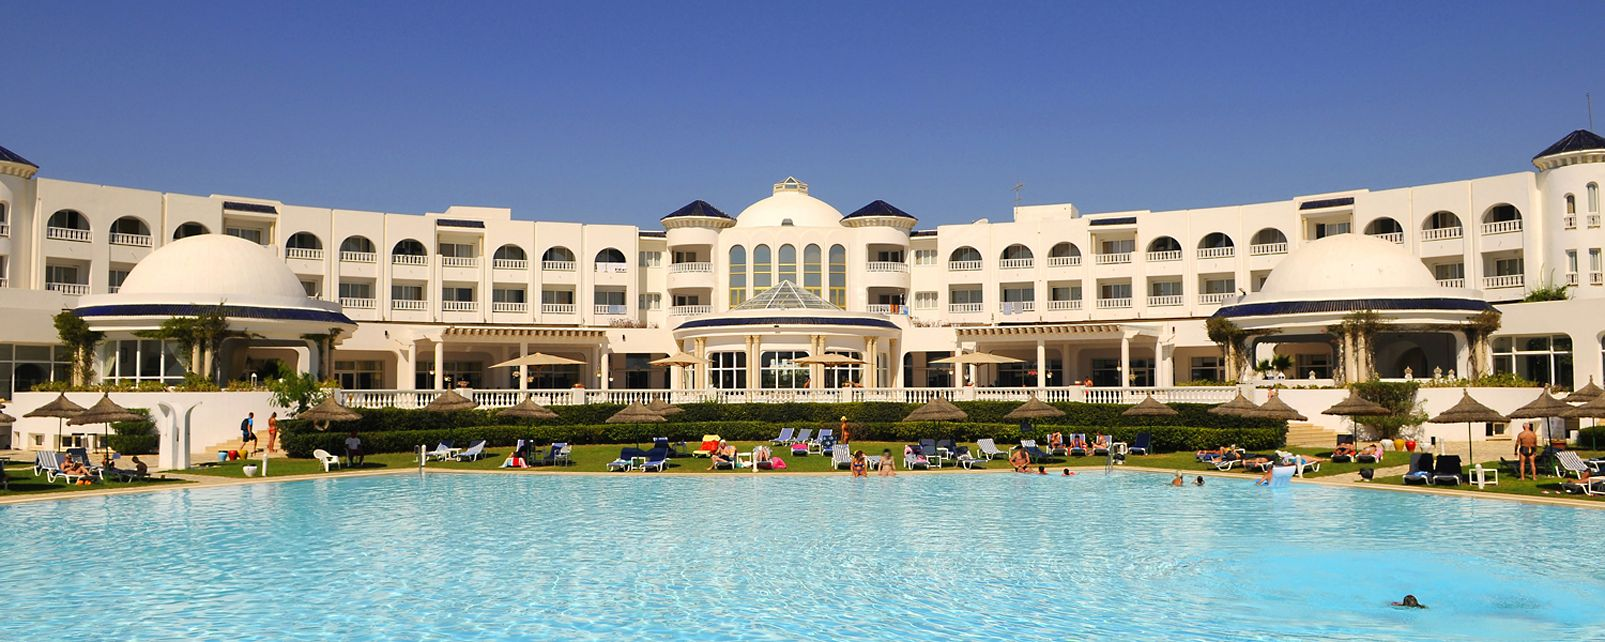 Hotel Golden Tulip Taj Sultan